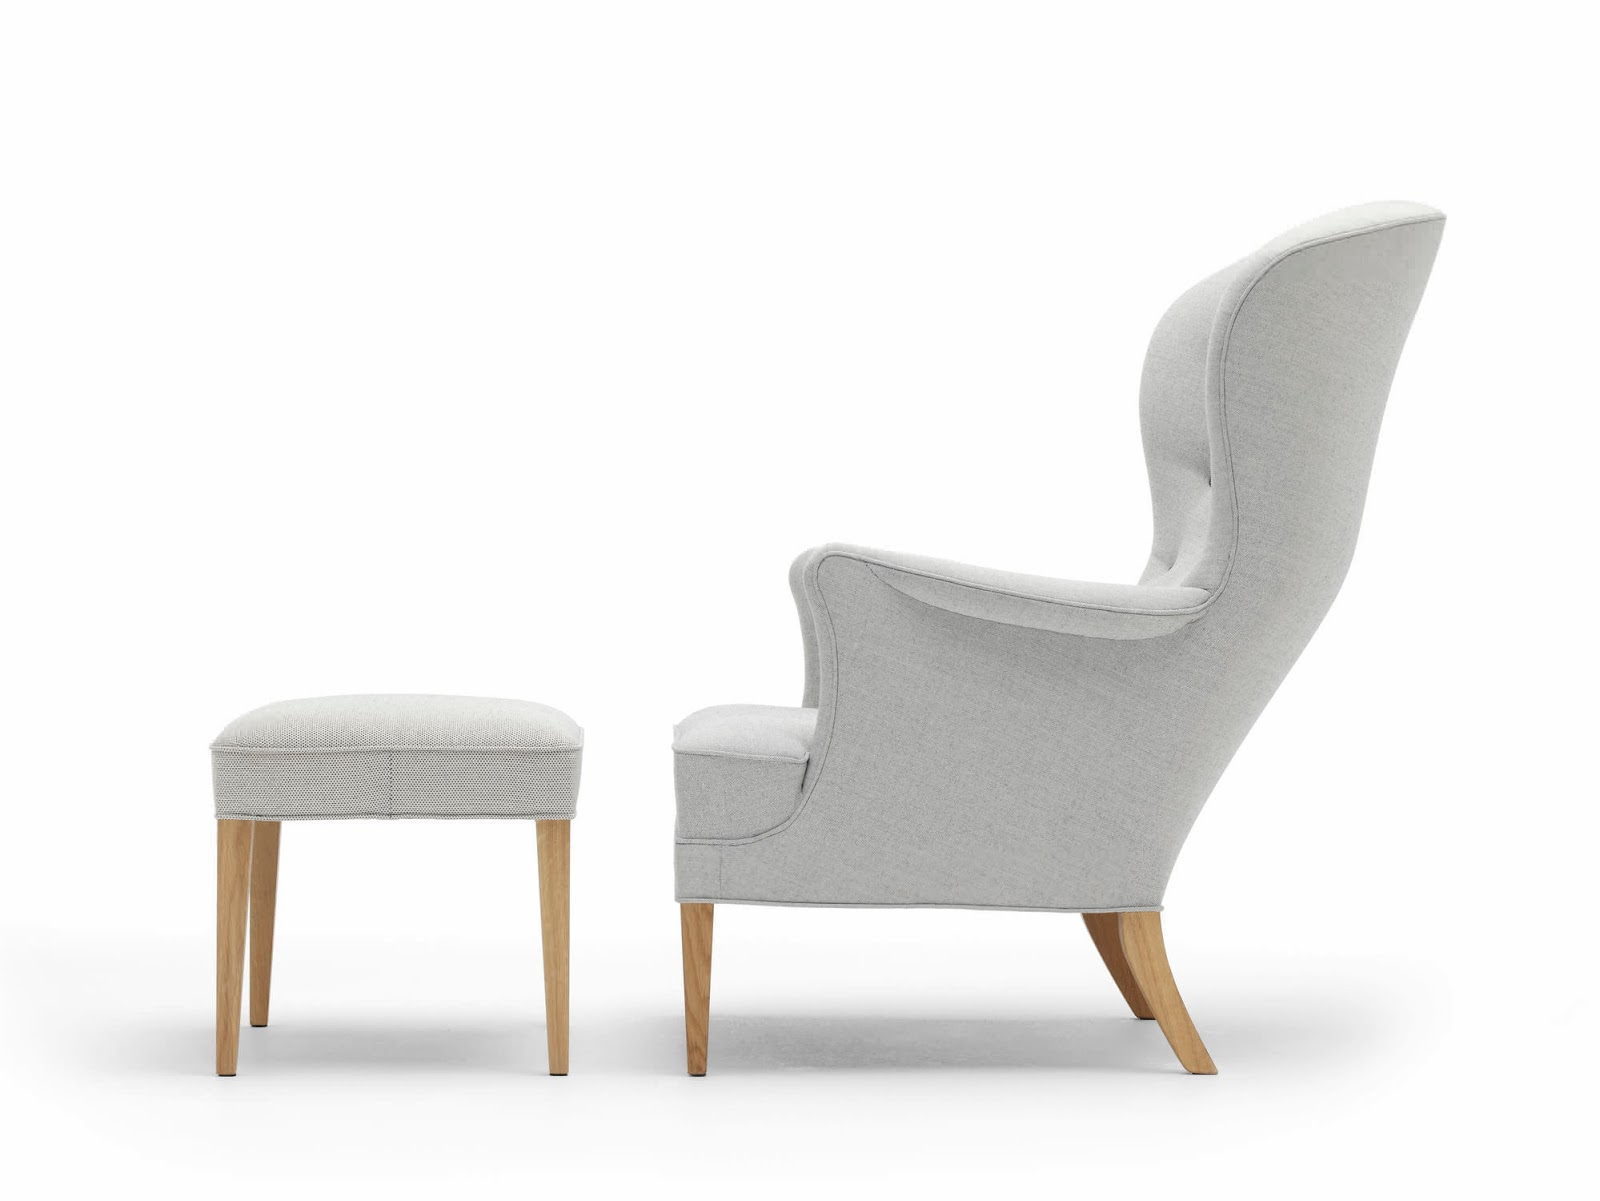 Chair Design Scandinavian Graco High Replacement Cover Uk Designs Furniture Sofa